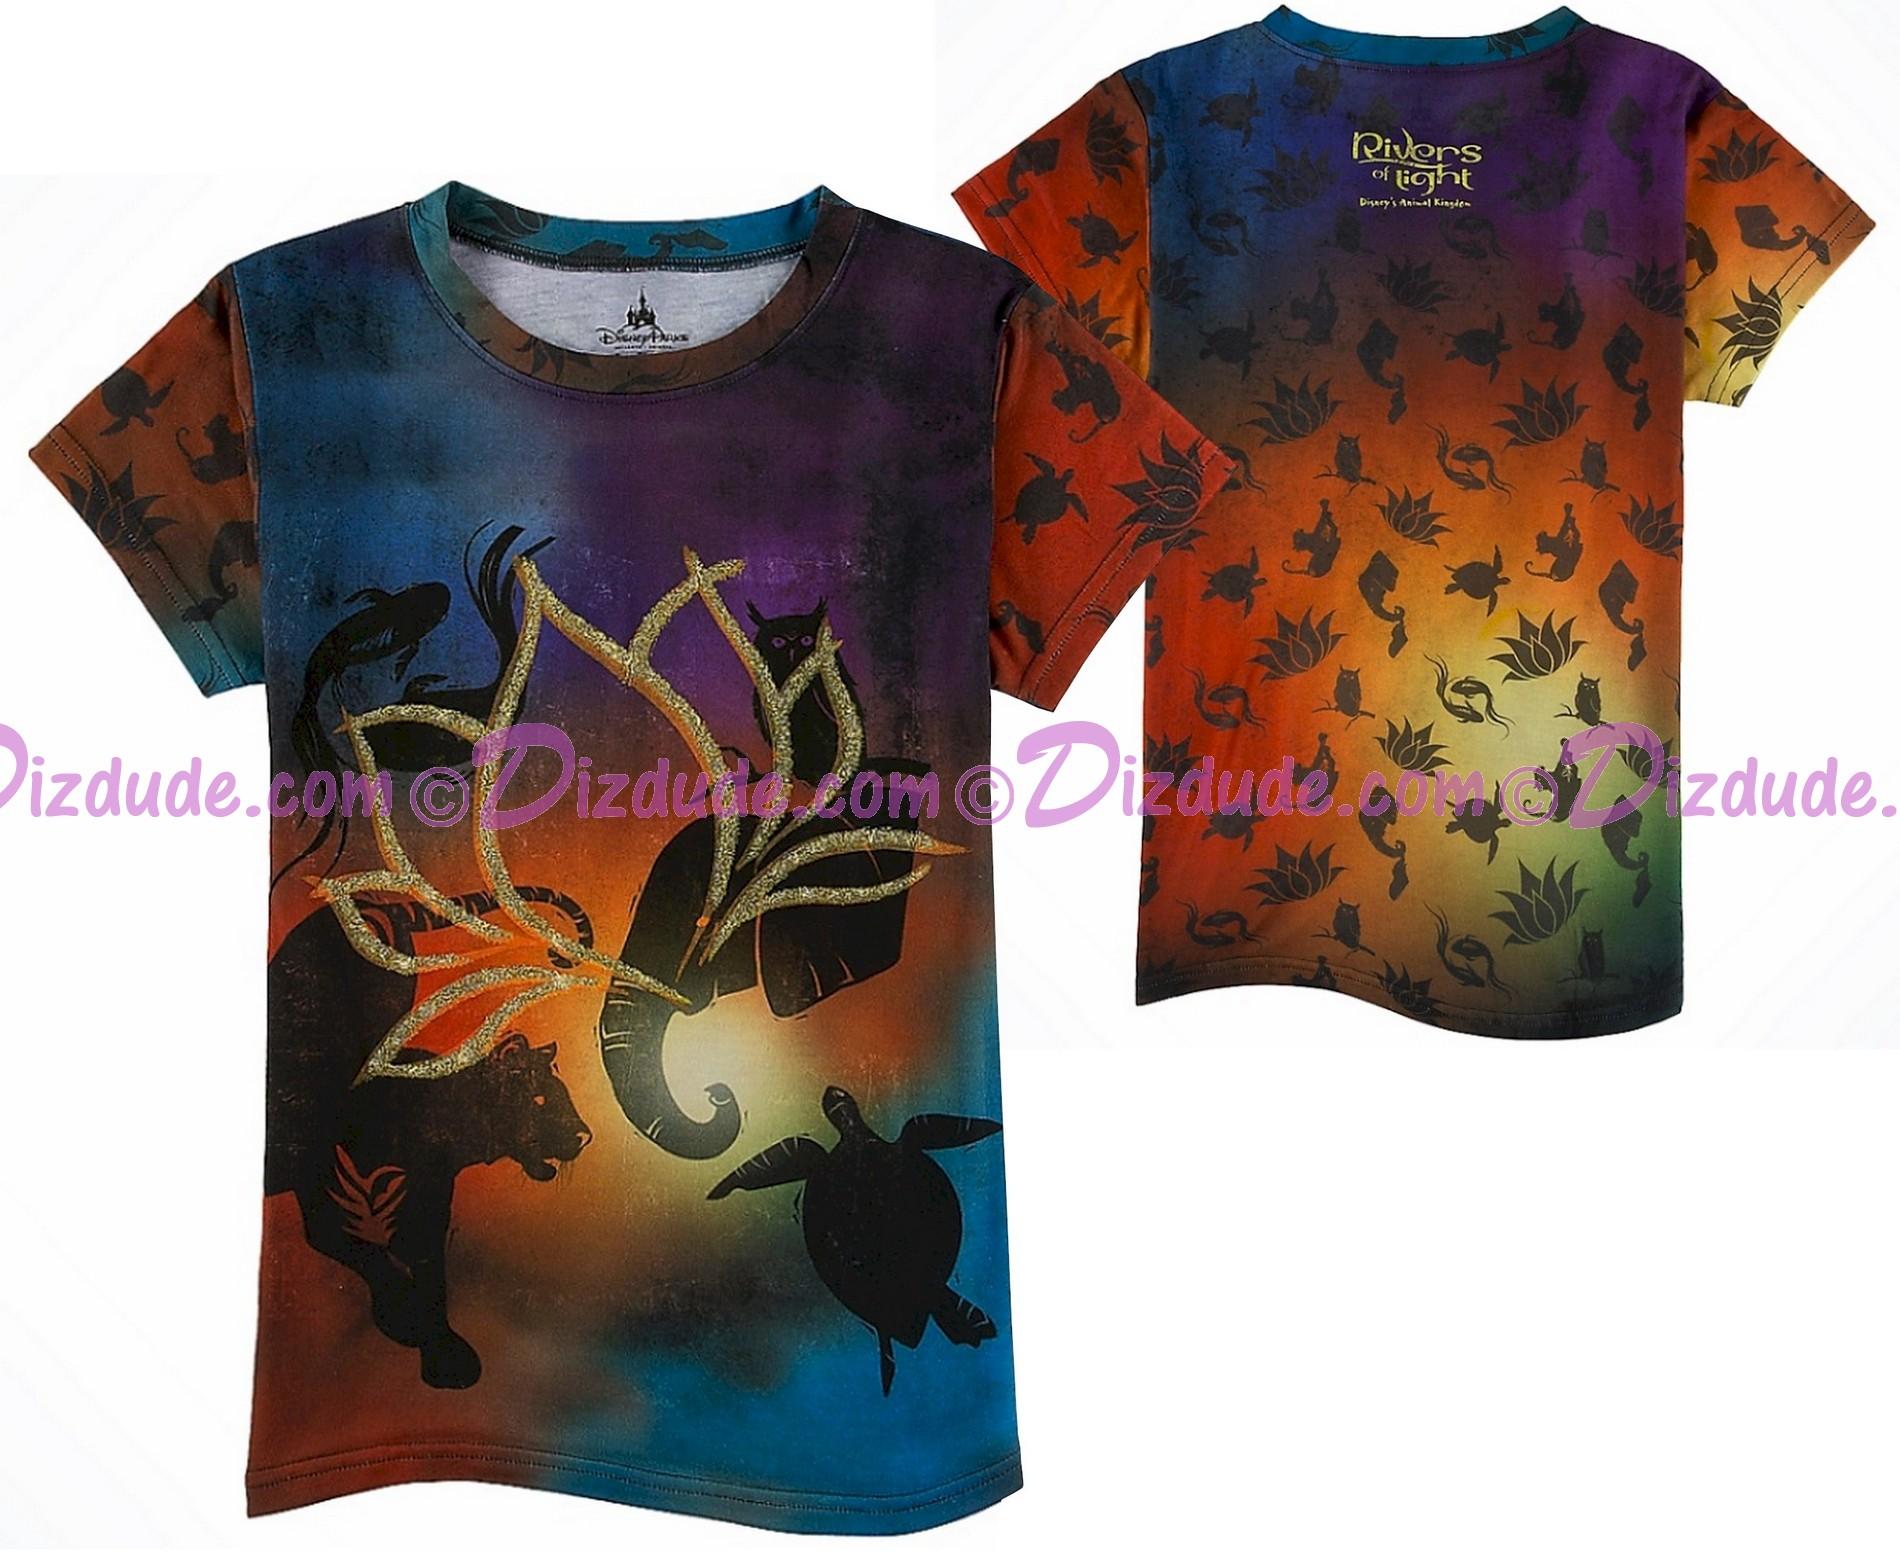 Rivers Of Light Gold Lotus All Over Print Youth T-Shirt (Tee, Tshirt or T shirt) ~ Disney Animal Kingdom